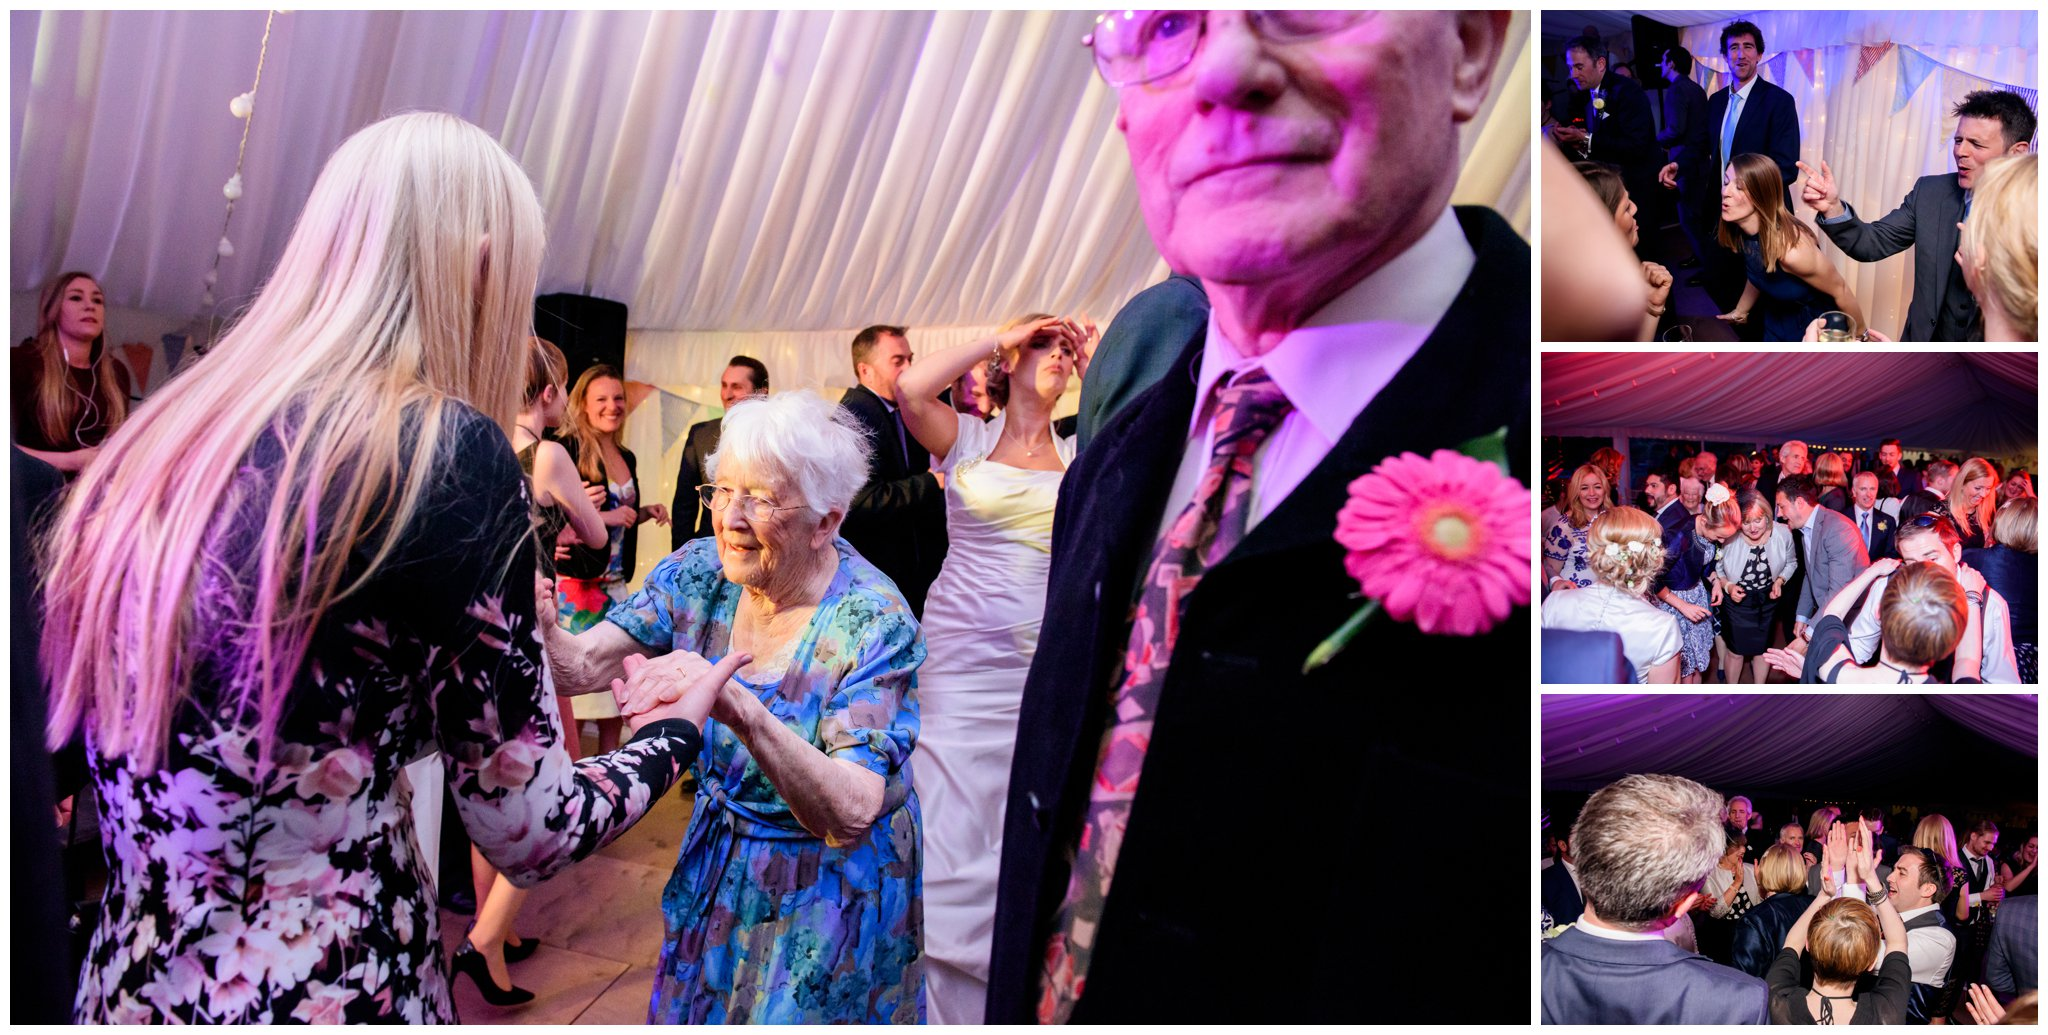 Grandma dancing fun wedding reception at deans court wimborne dorset